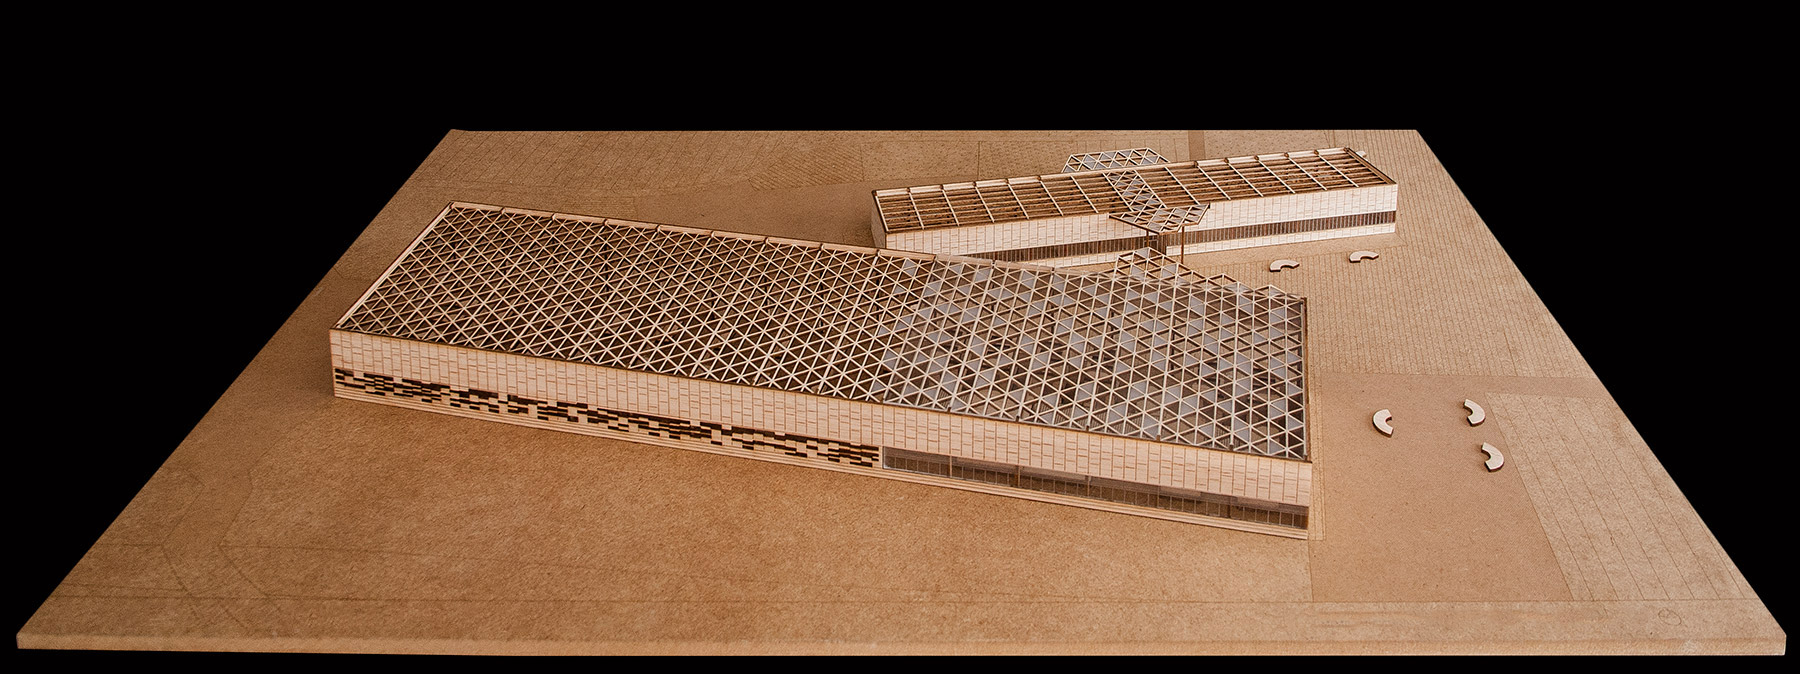 maqueta-arquitectura-architecture-model-valencia-maqueta-pfc-ETSAV-centro-artesanos--(8)